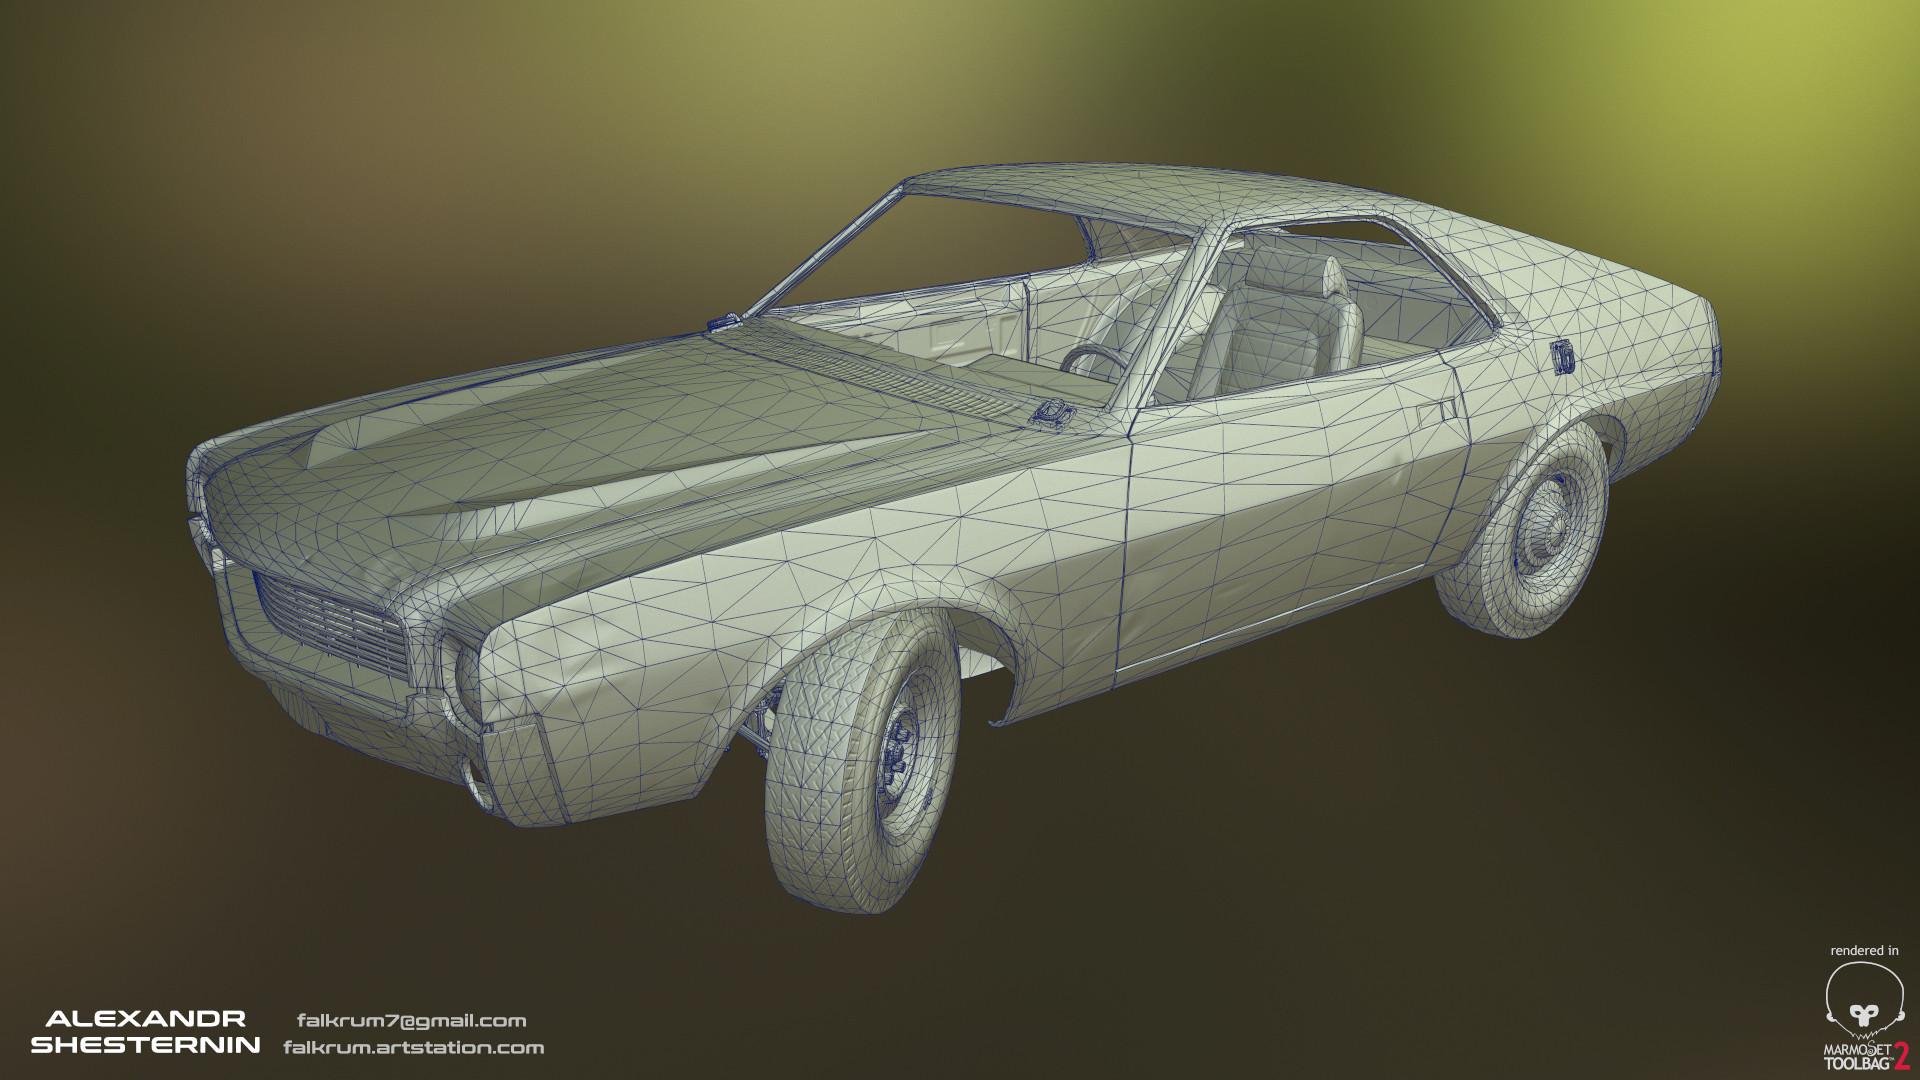 Alexandr shesternin modular abandoned car10